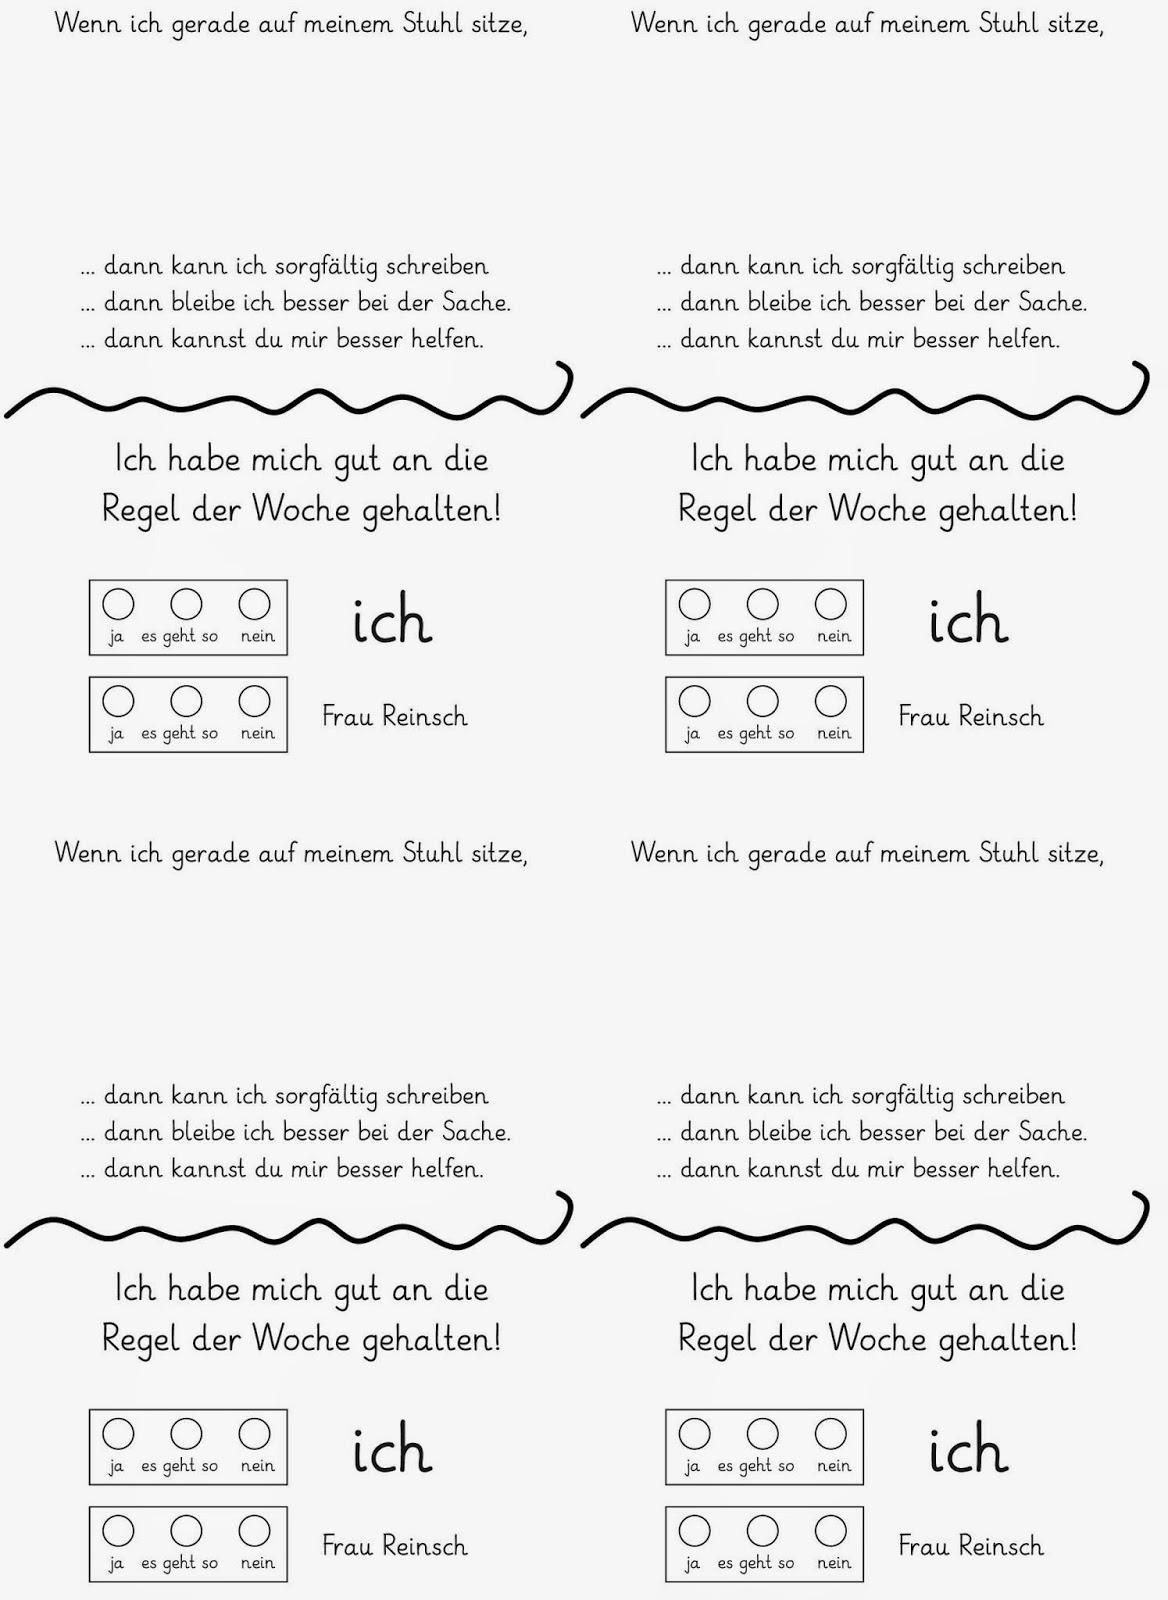 Klassenregeln grundschule bildkarten  Lernstübchen: die verflixten Klassenregeln